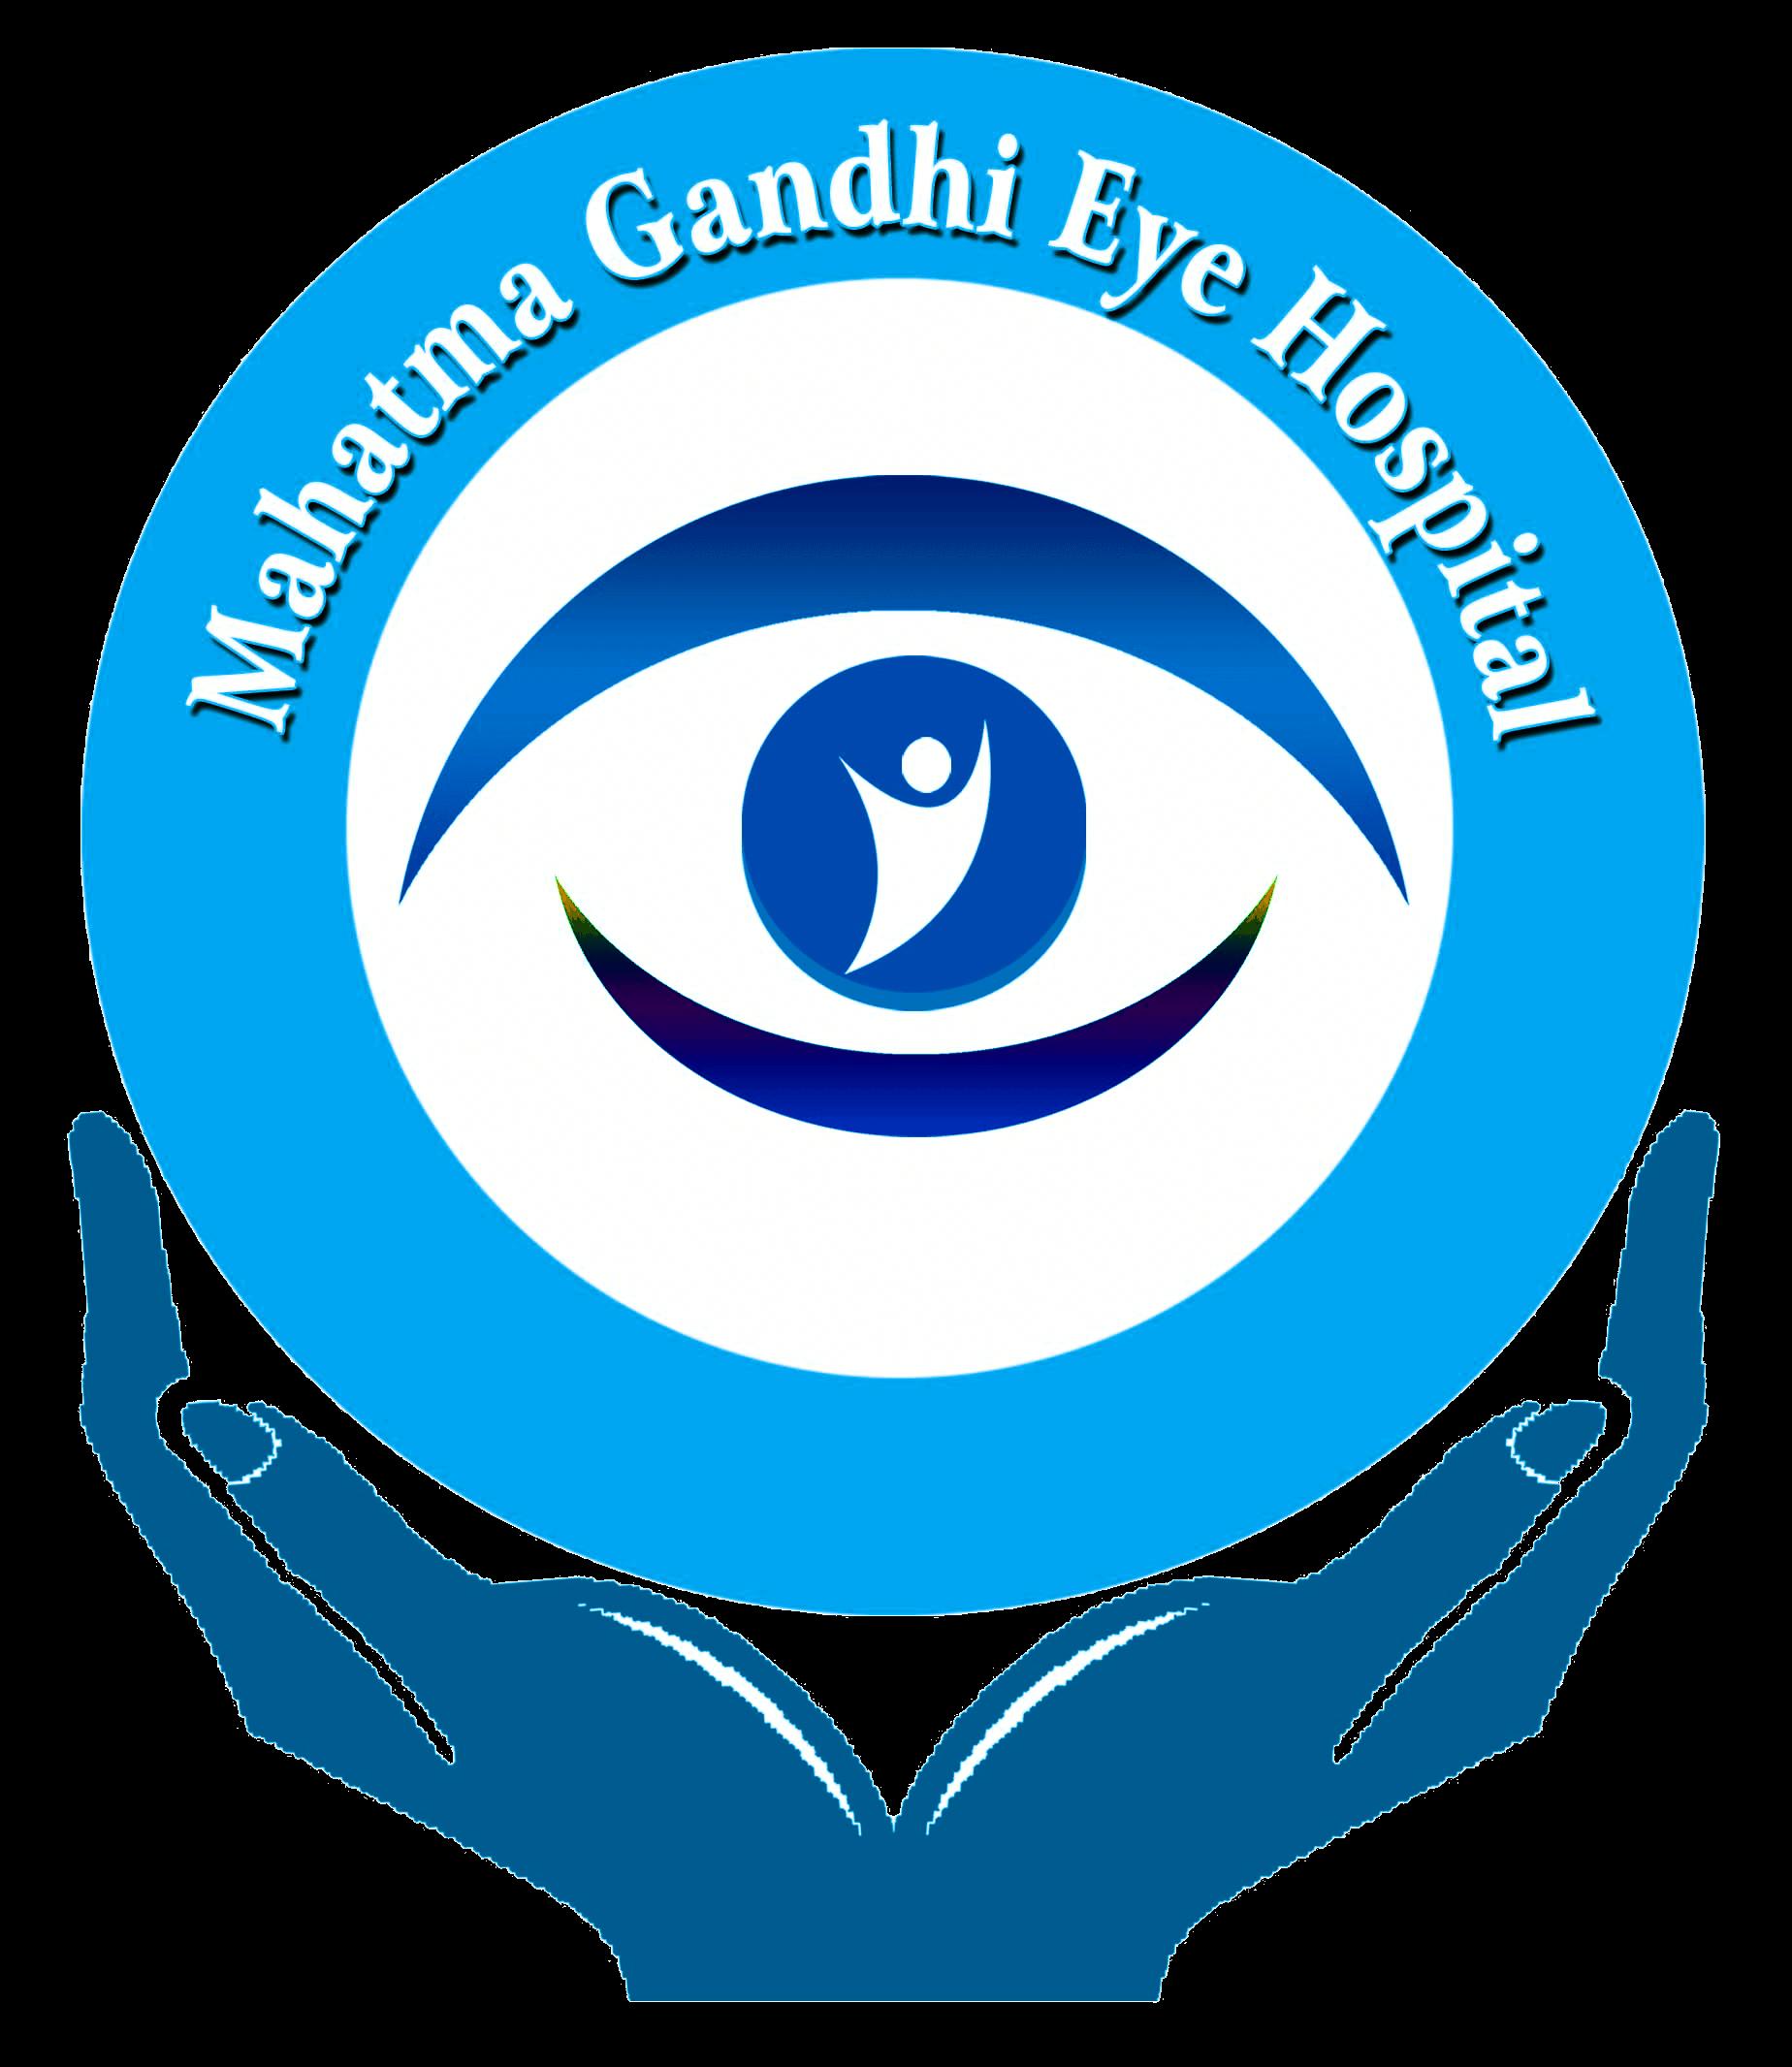 Nurse clipart operating theatre. Objectives mahatma gandhi eye